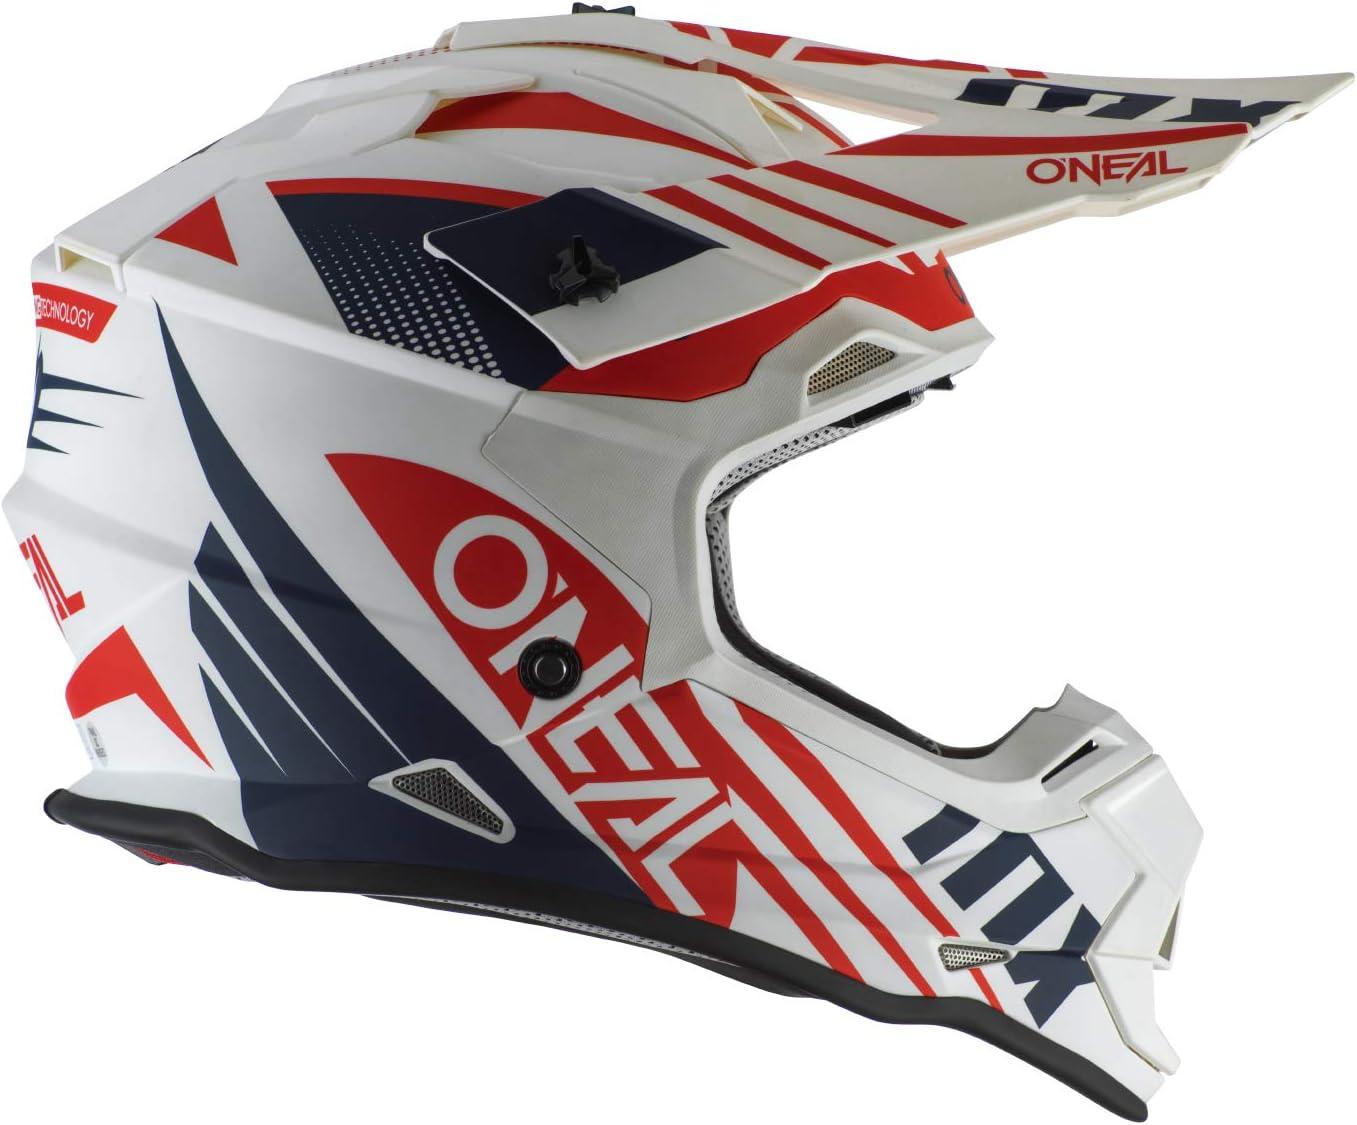 55//56cm 2SRS Helmet SPYDE 2.0 black//teal//red S